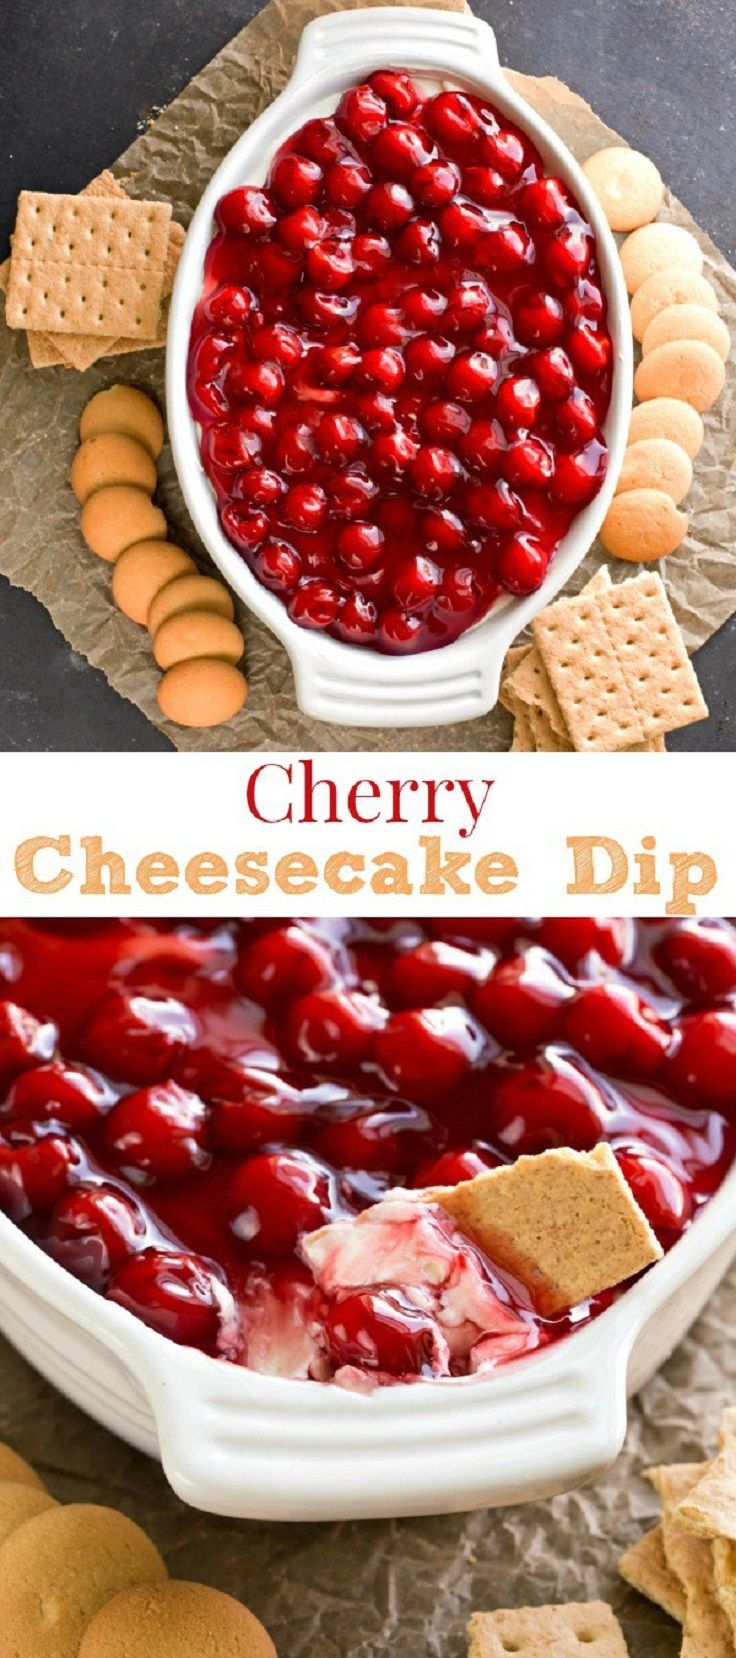 Cherry Cheesecake Dip – Thanksgiving Food List: 15 Creative Food Ideas for A Fab…